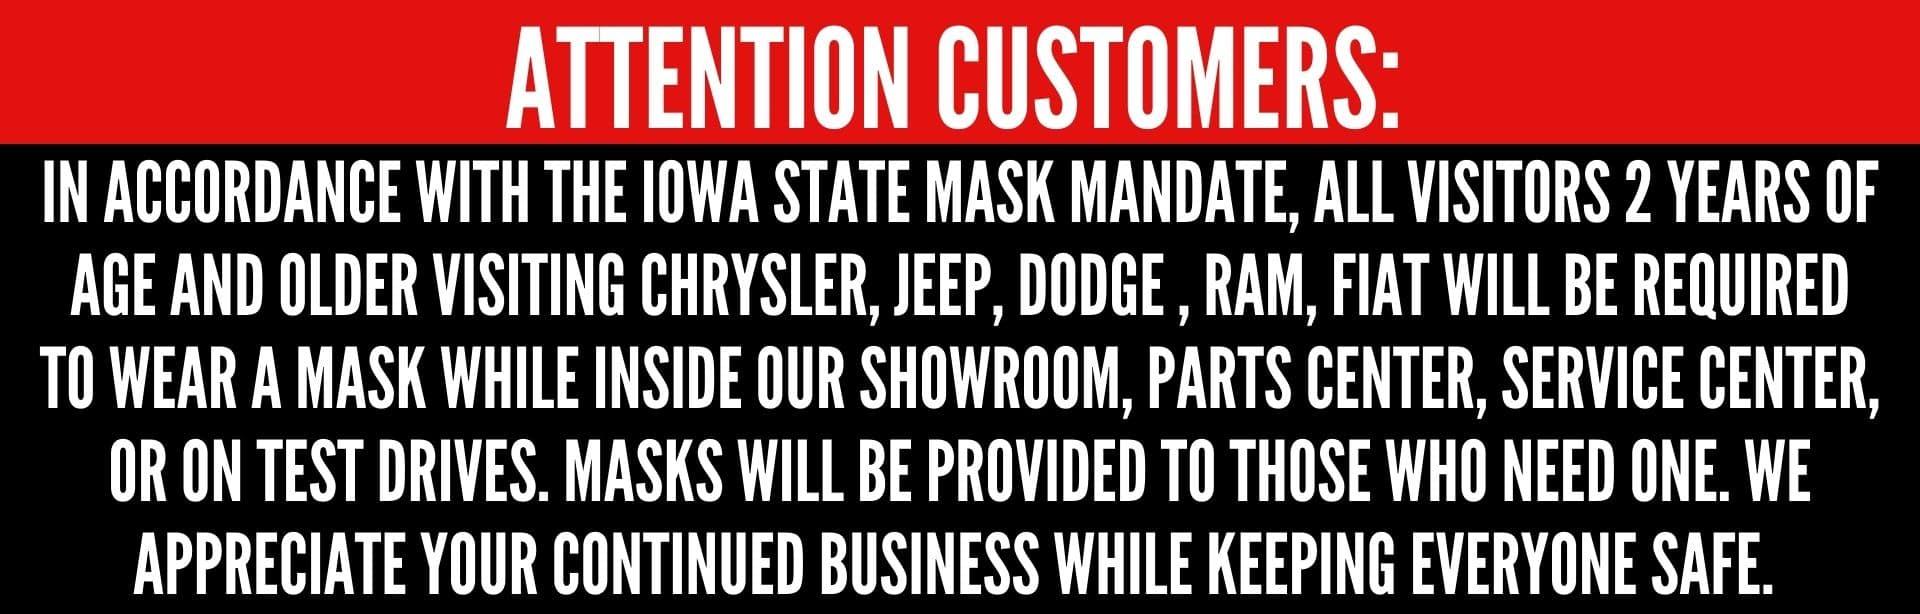 Must wear mask at Edwards CDJR